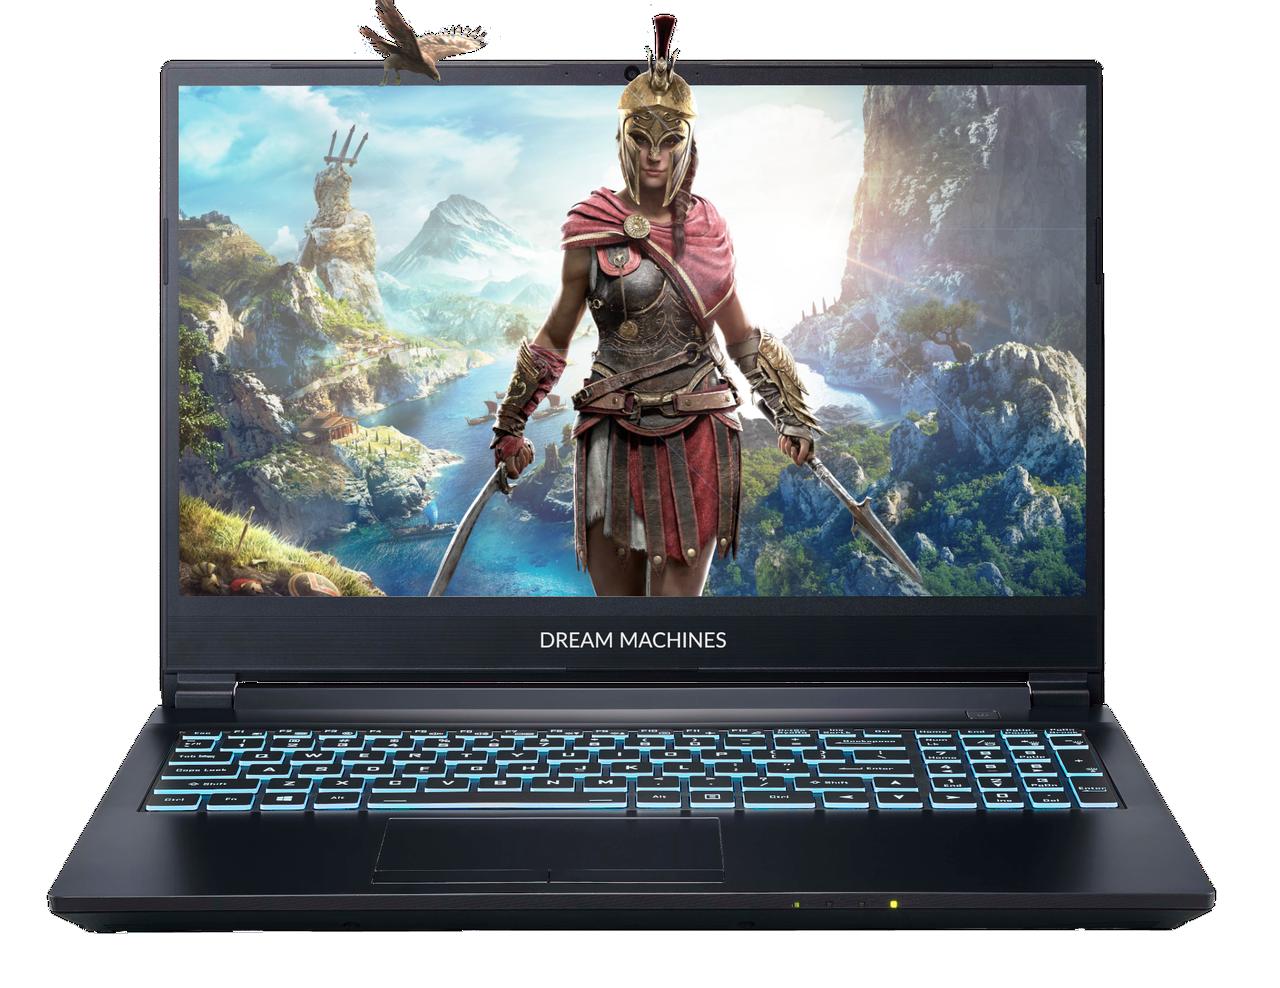 Игровой ноутбук Dream Machines G1650Ti-15XX07 <15.6'' FHD WVA, i7-10750H, GTX1650Ti 4GB)